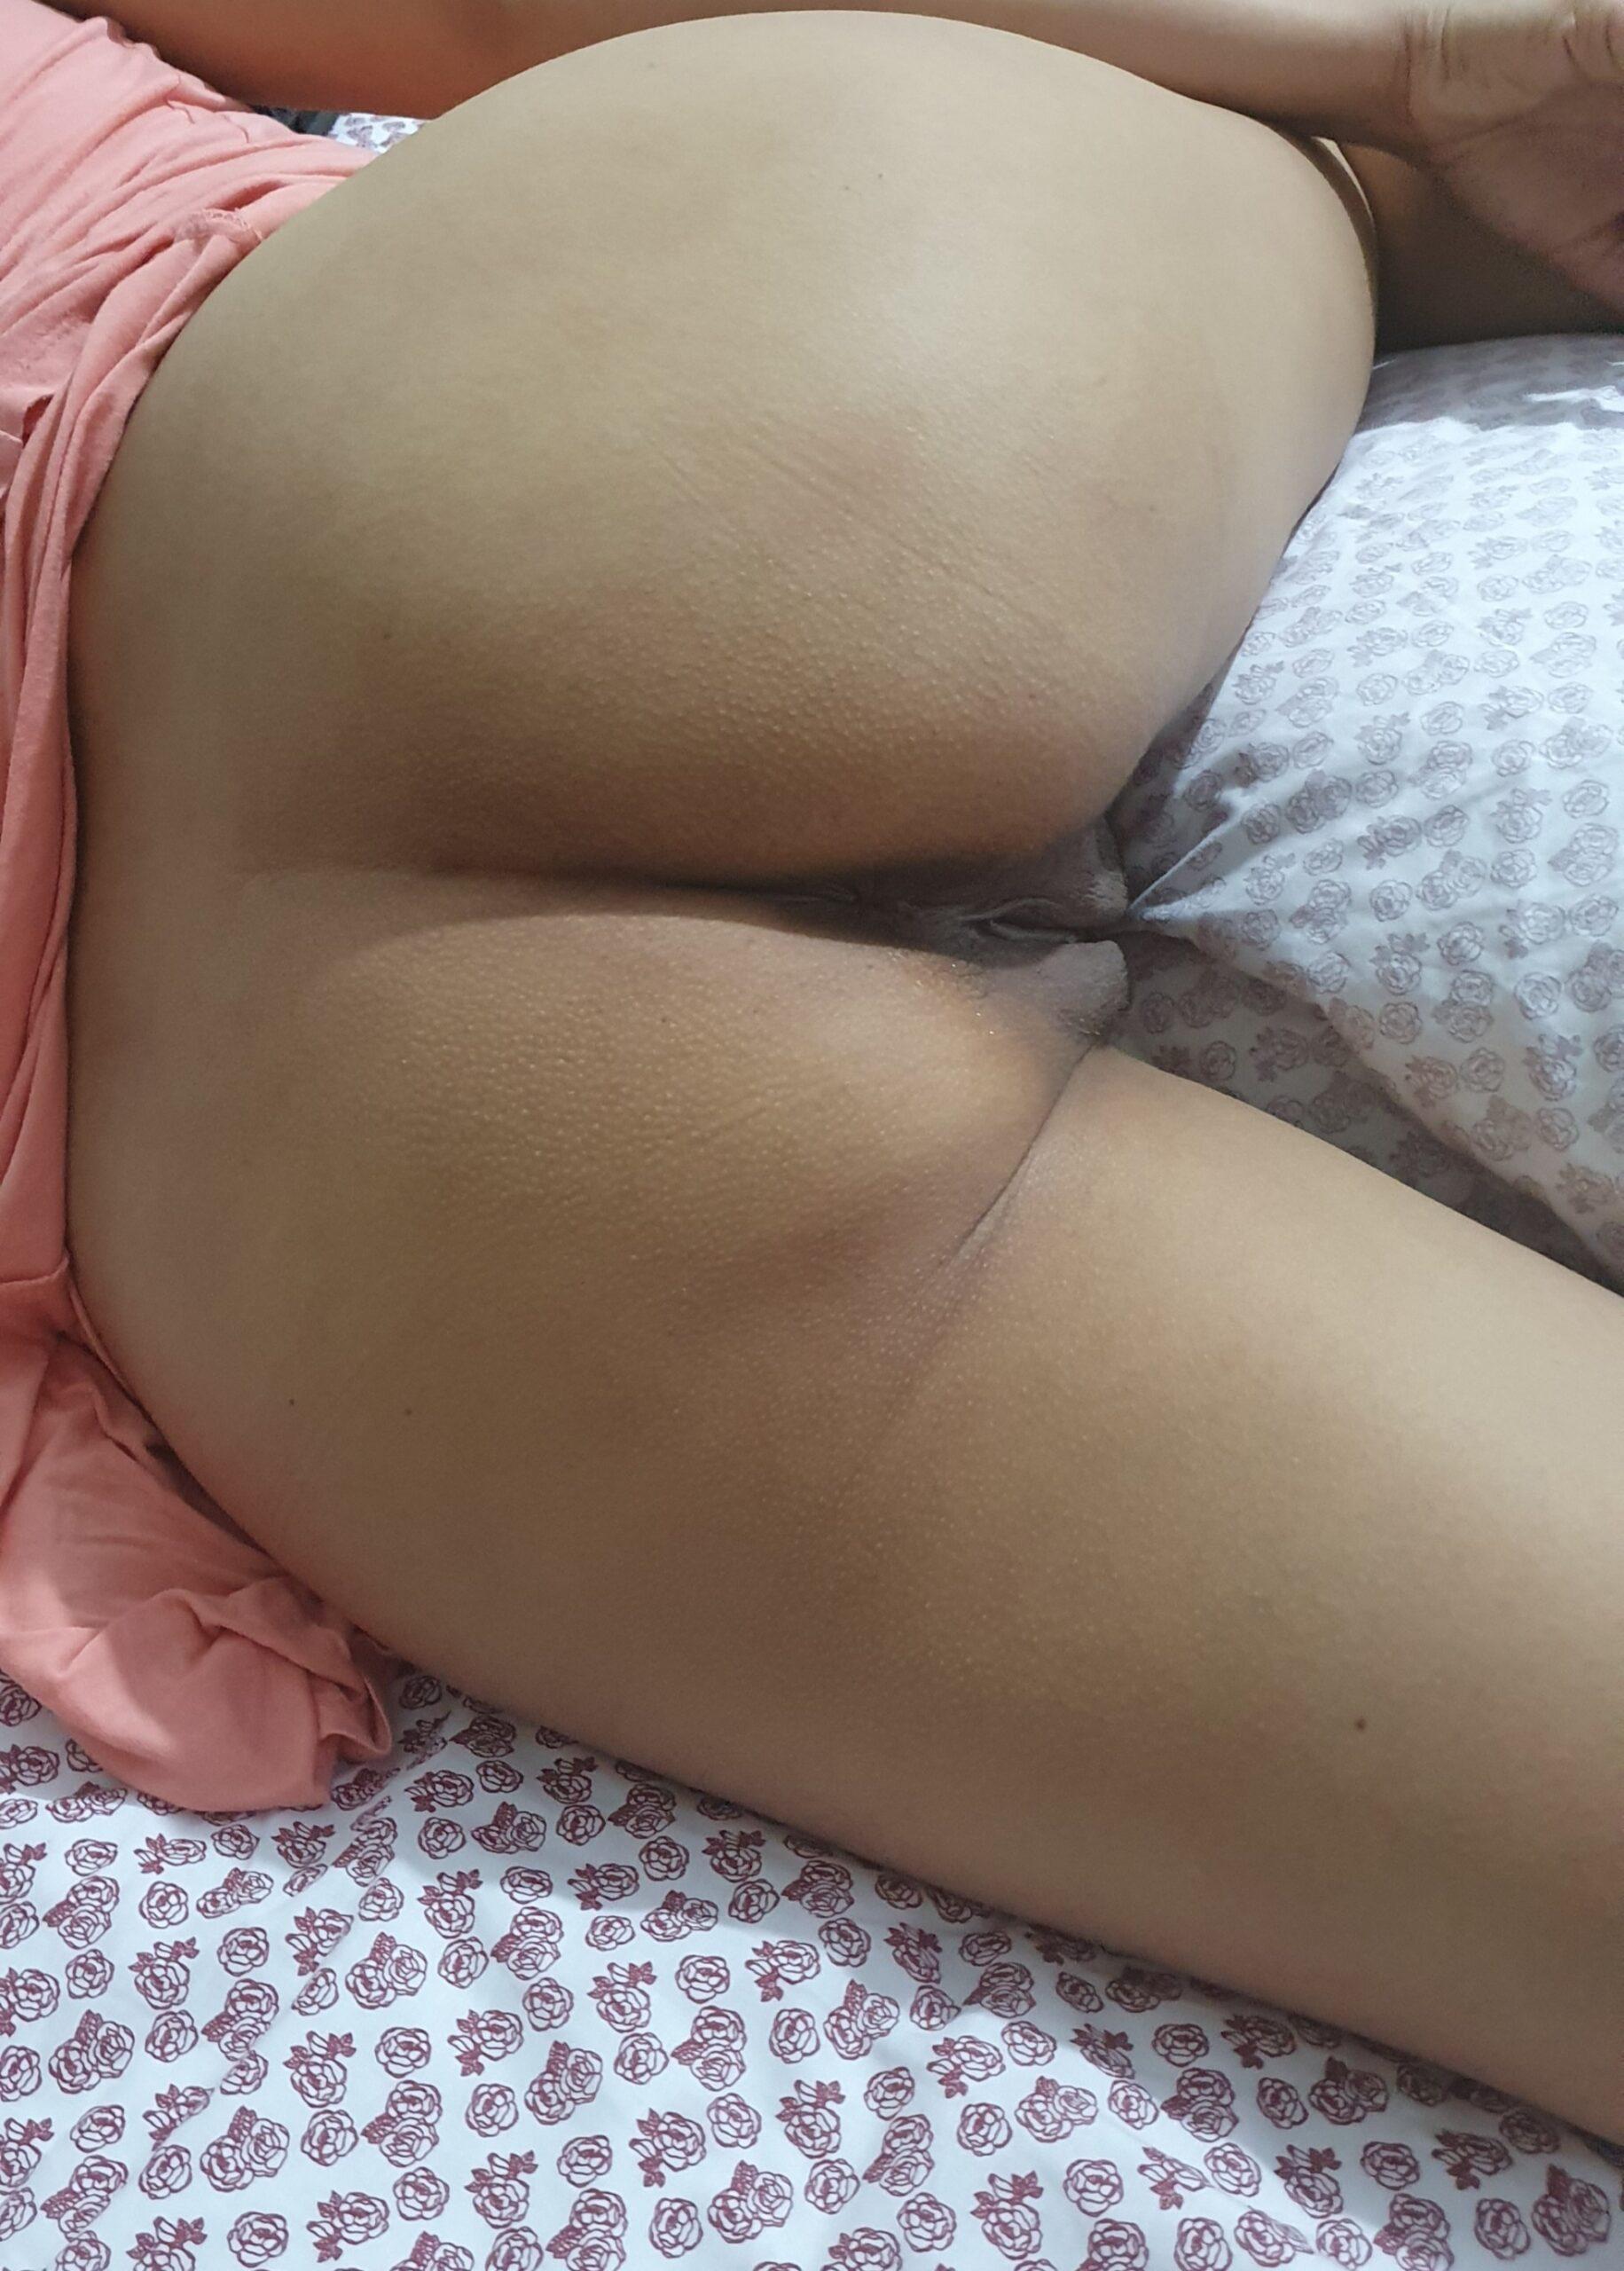 fotos porno melafo oslafo mujeres